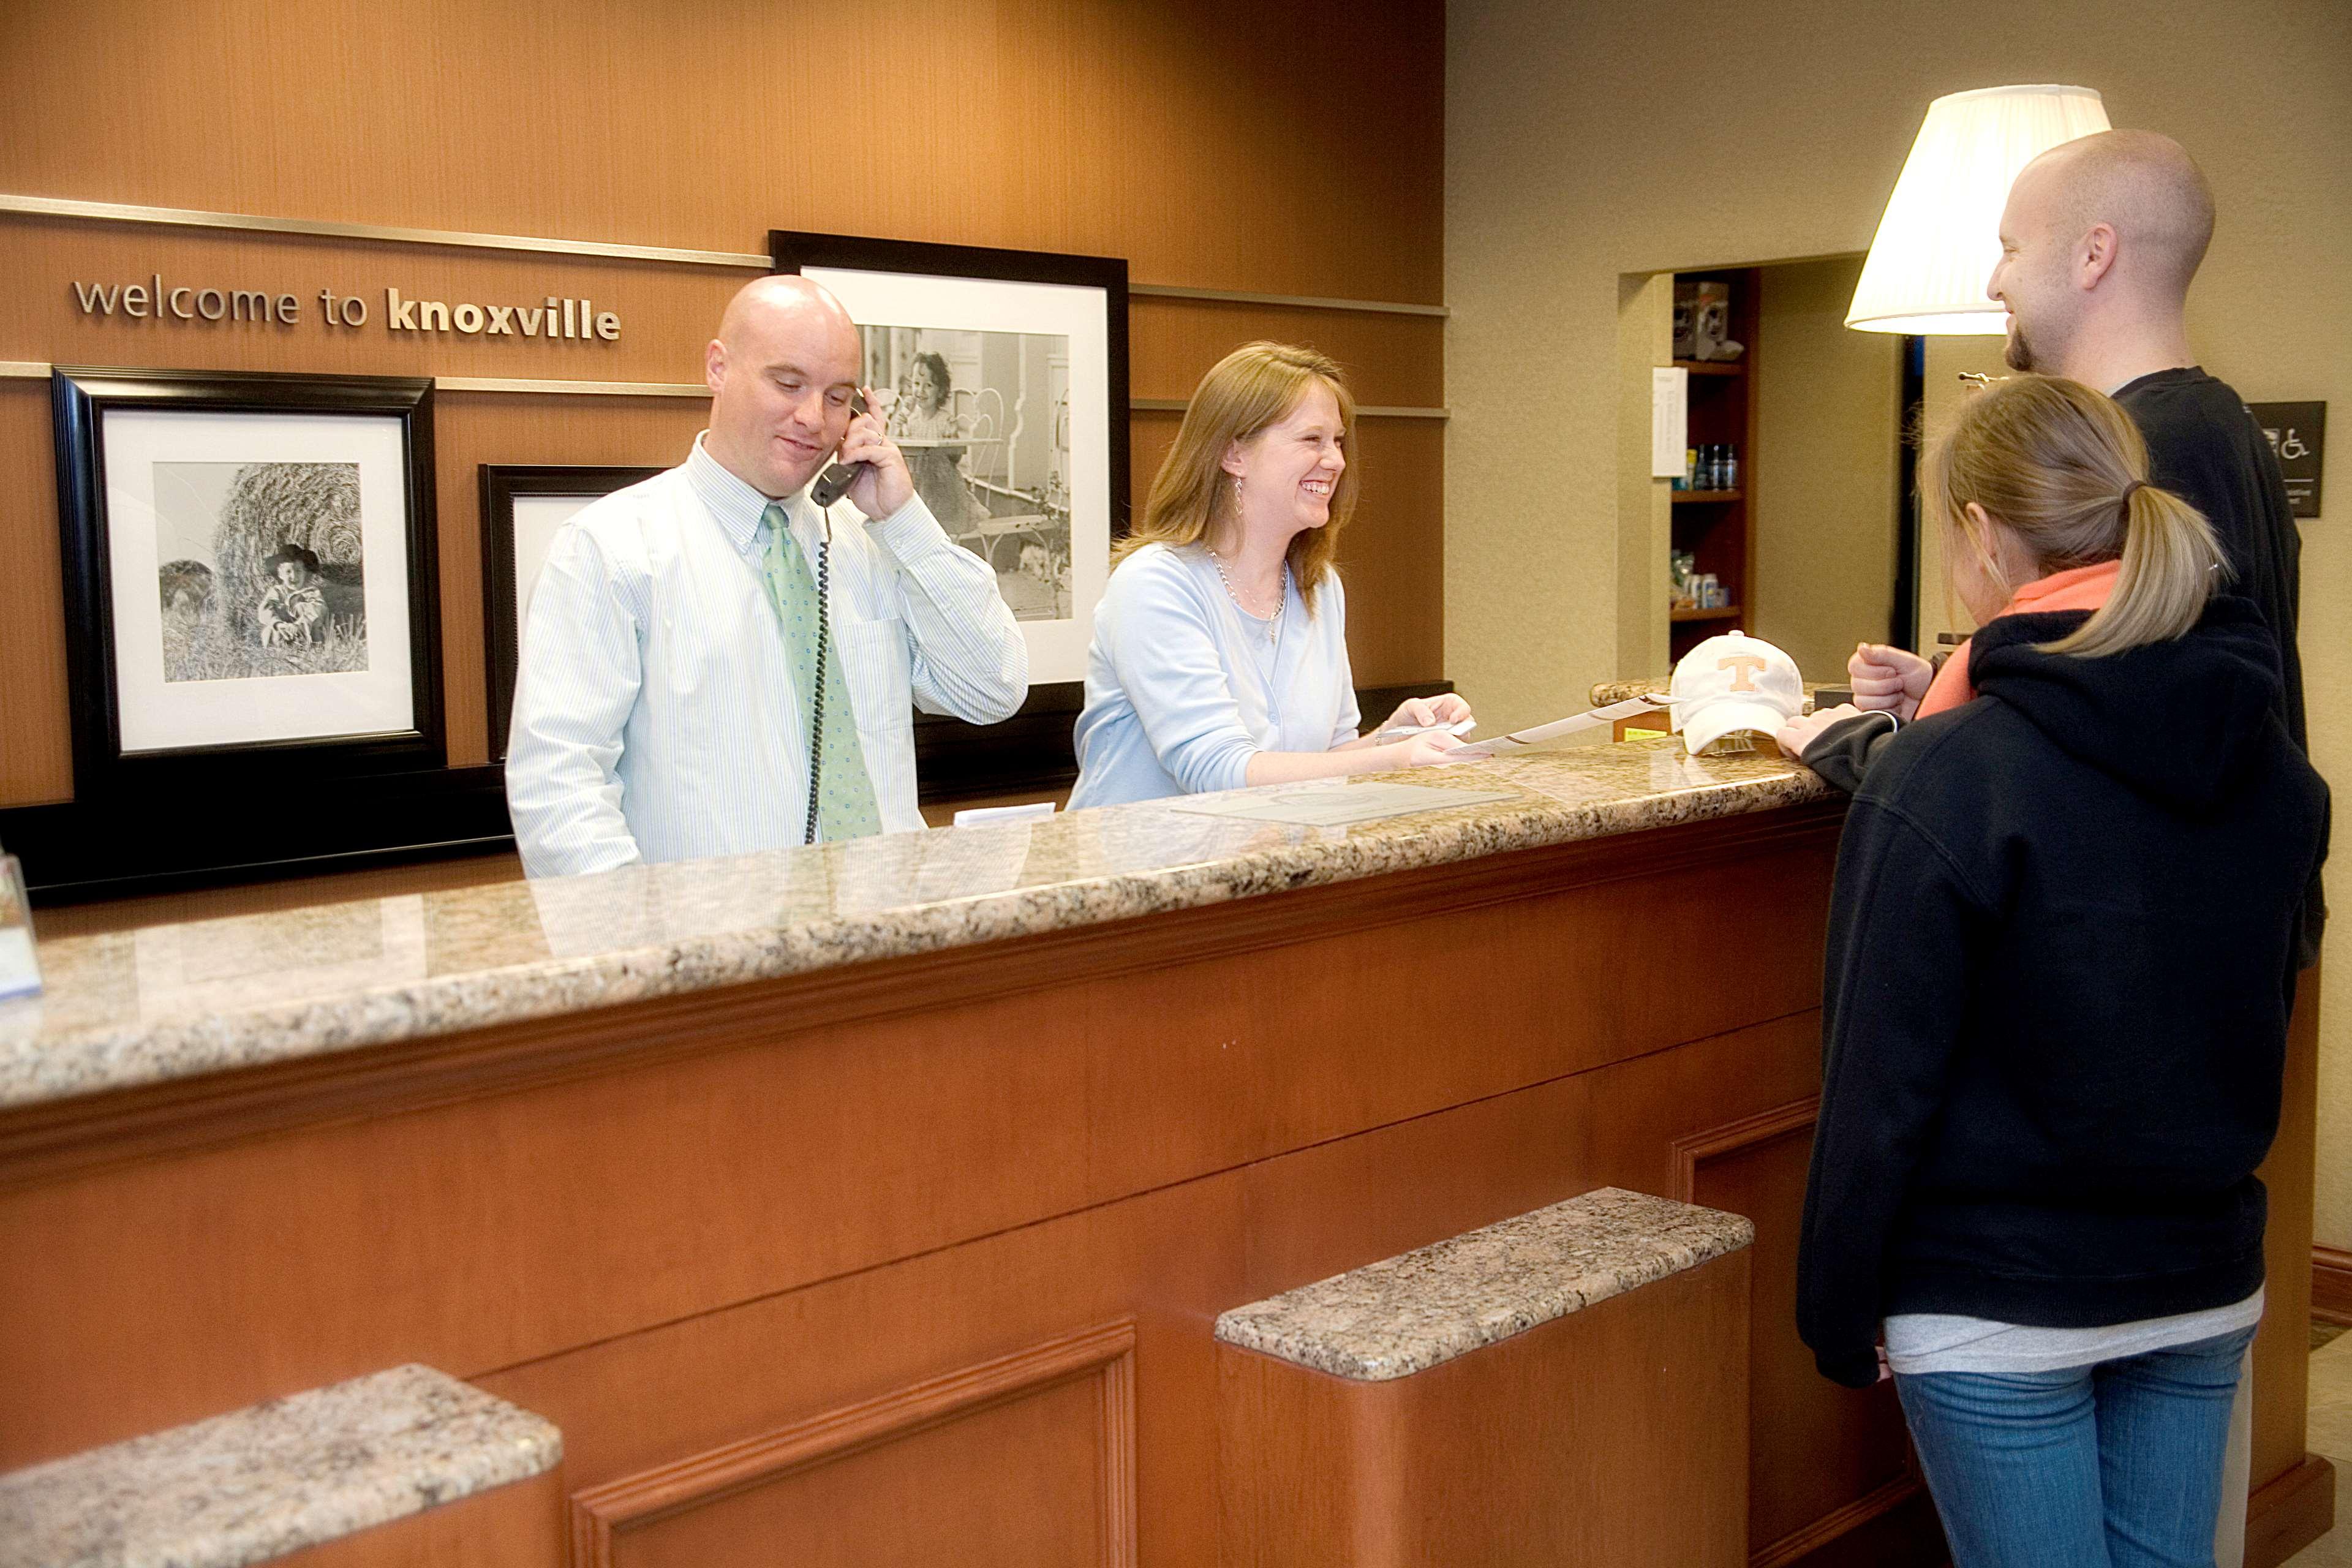 Hampton Inn & Suites Knoxville-Downtown image 7